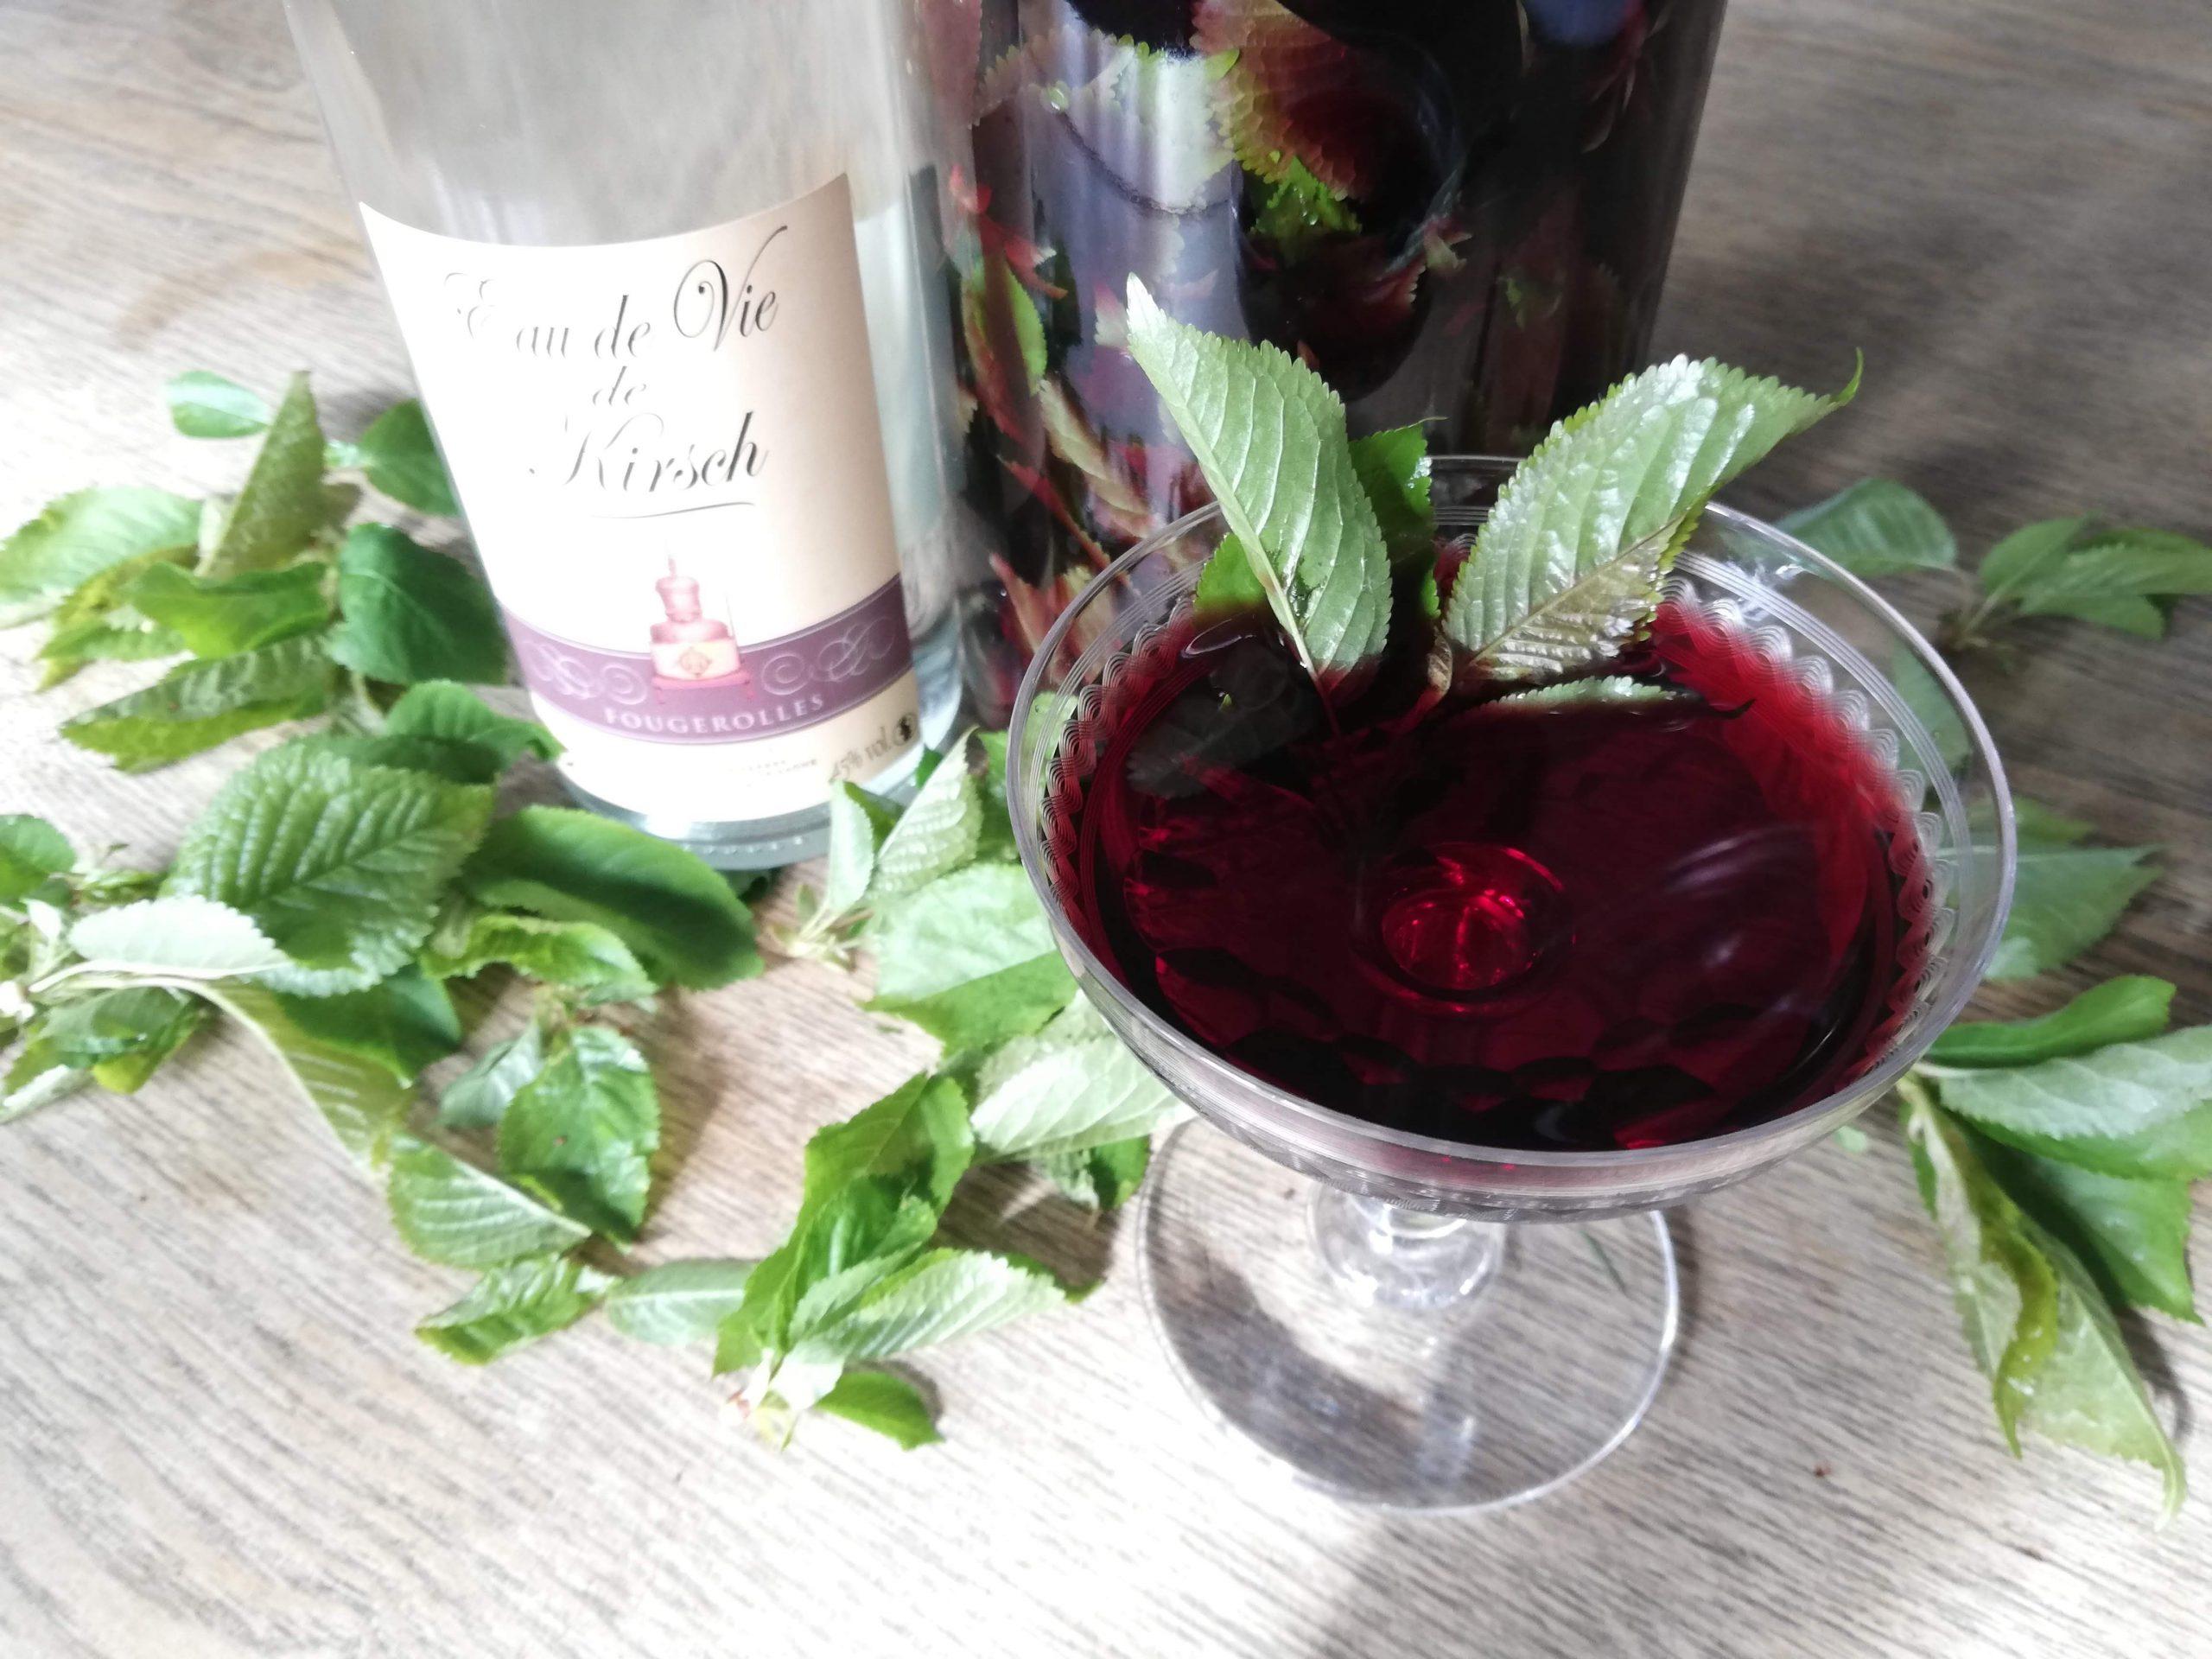 vin de merisier (Fleur)